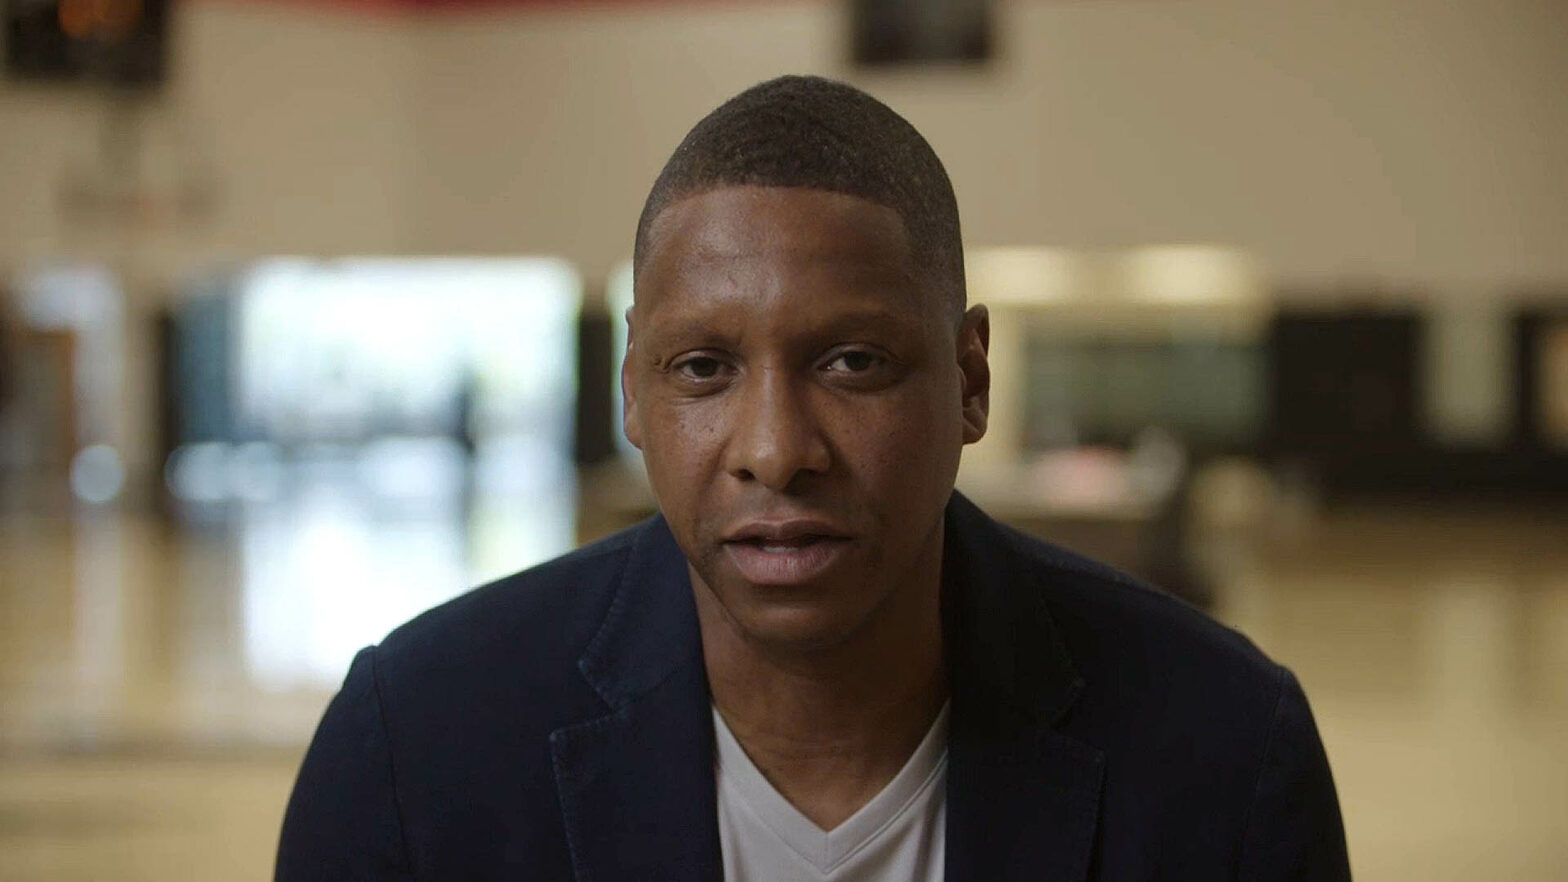 Masai Ujiri: Another championship run is Raptors' sole focus | NBA.com